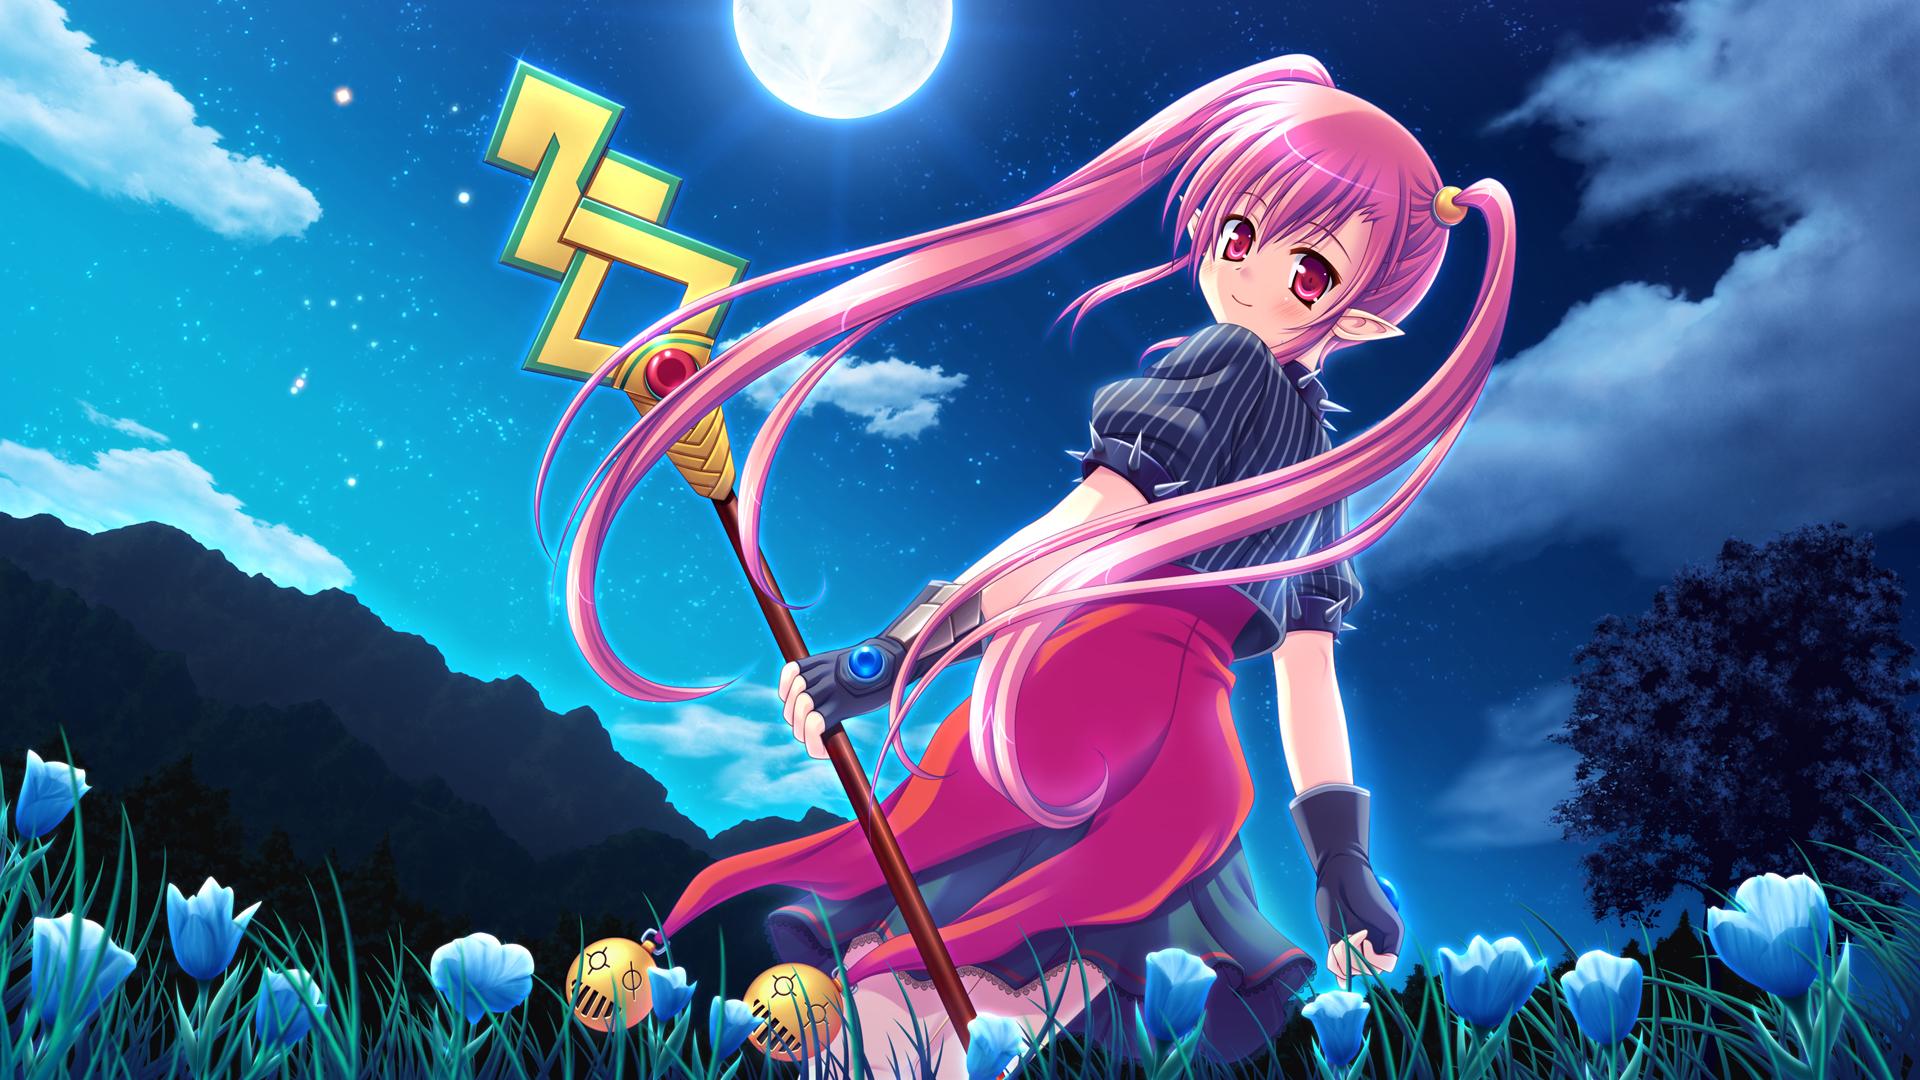 Dungeon Fighter Online anime wallpaper background 1920x1080